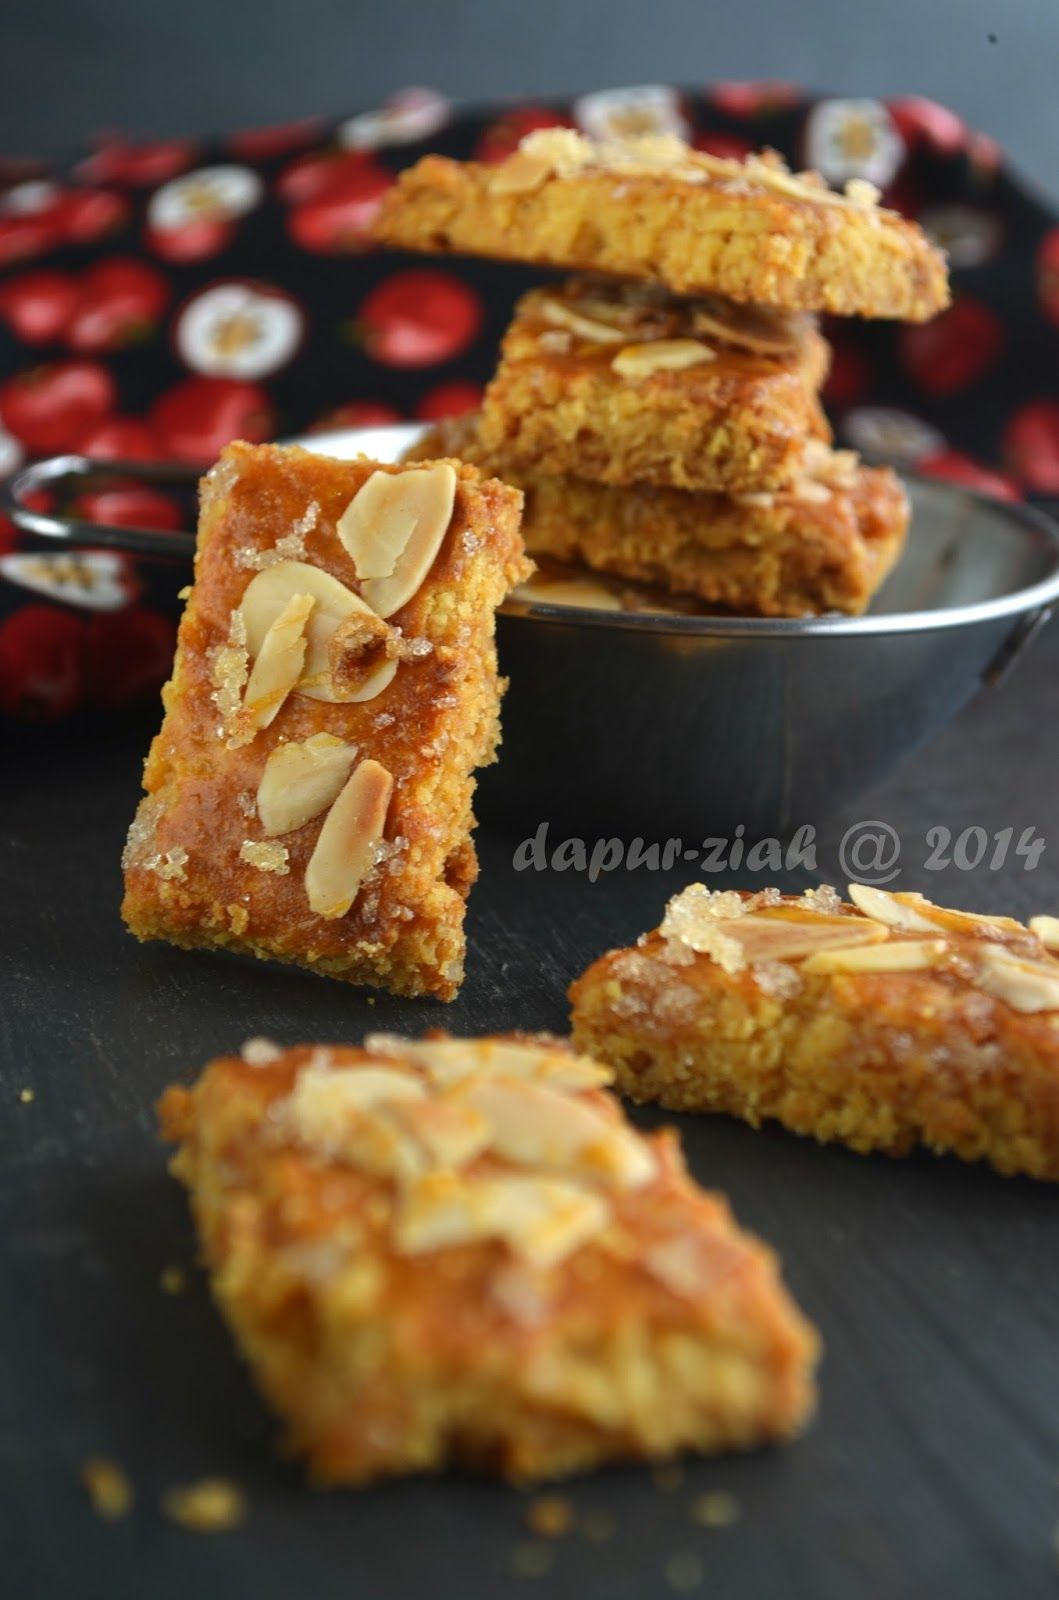 Janhagel Kue Kering Mentega Resep Biskuit Makanan Manis